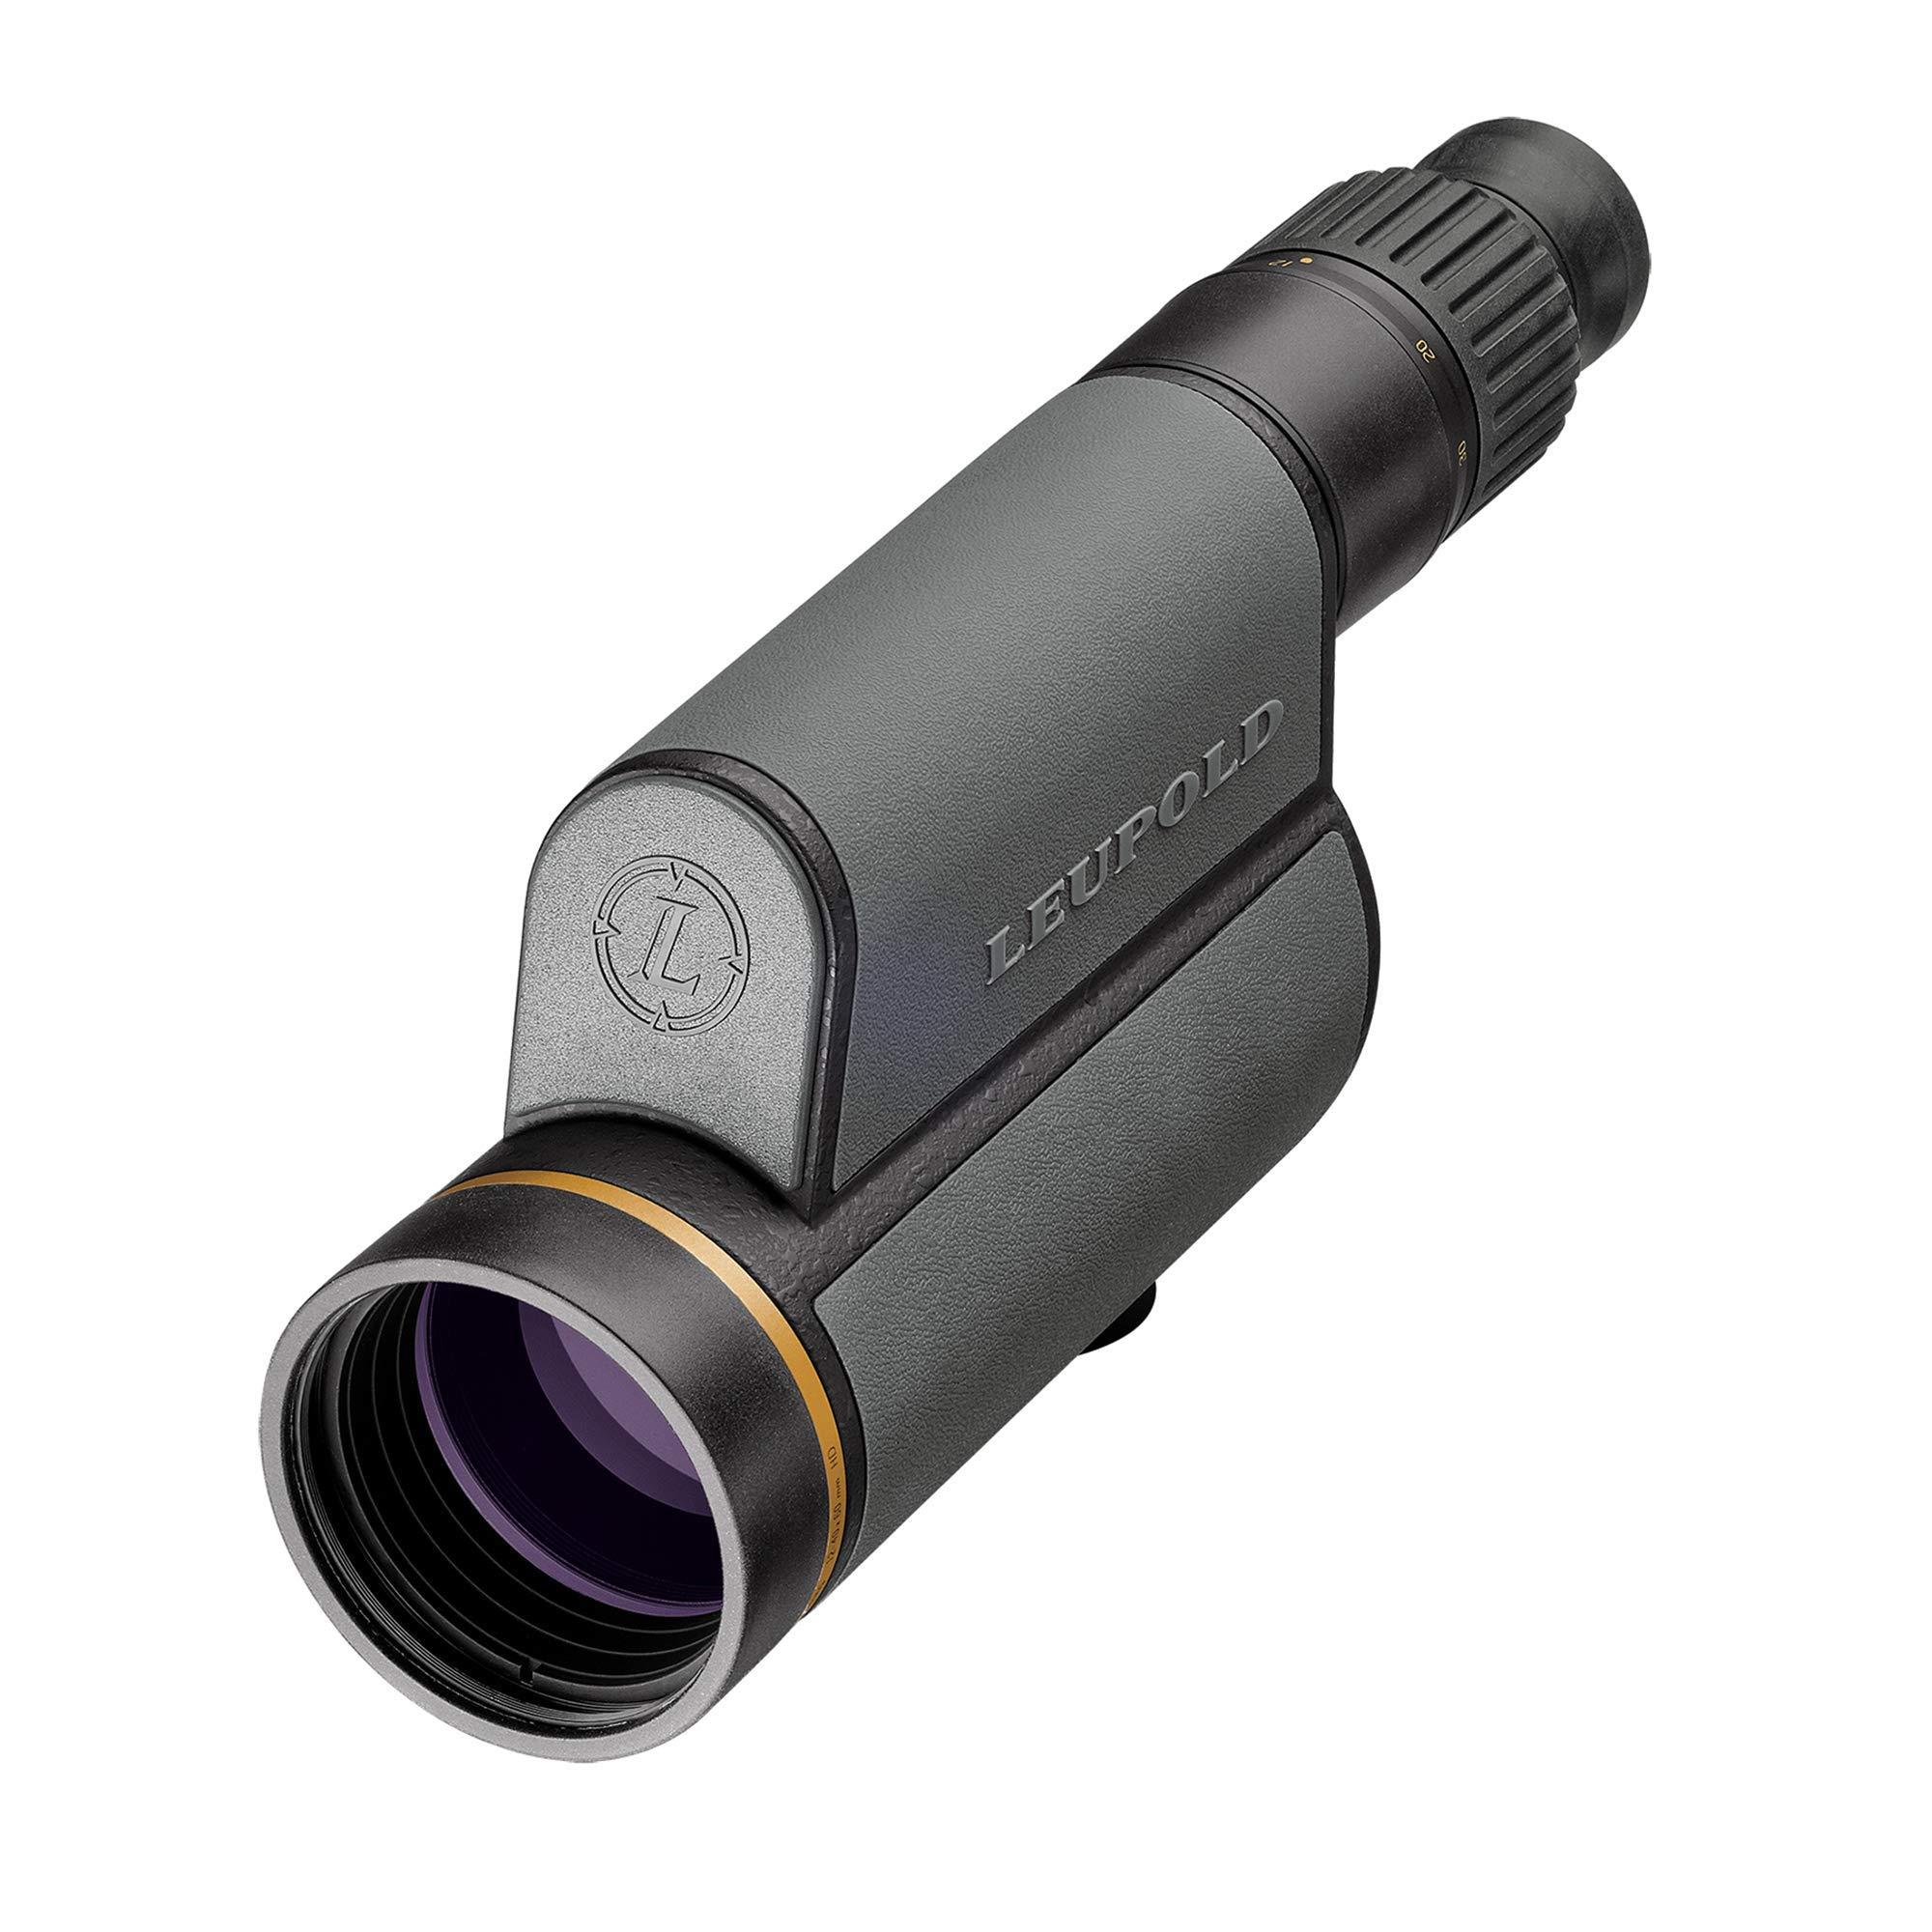 Leupold GR 12-40x60mm HD Gold Ring Spotting Scope by Leupold